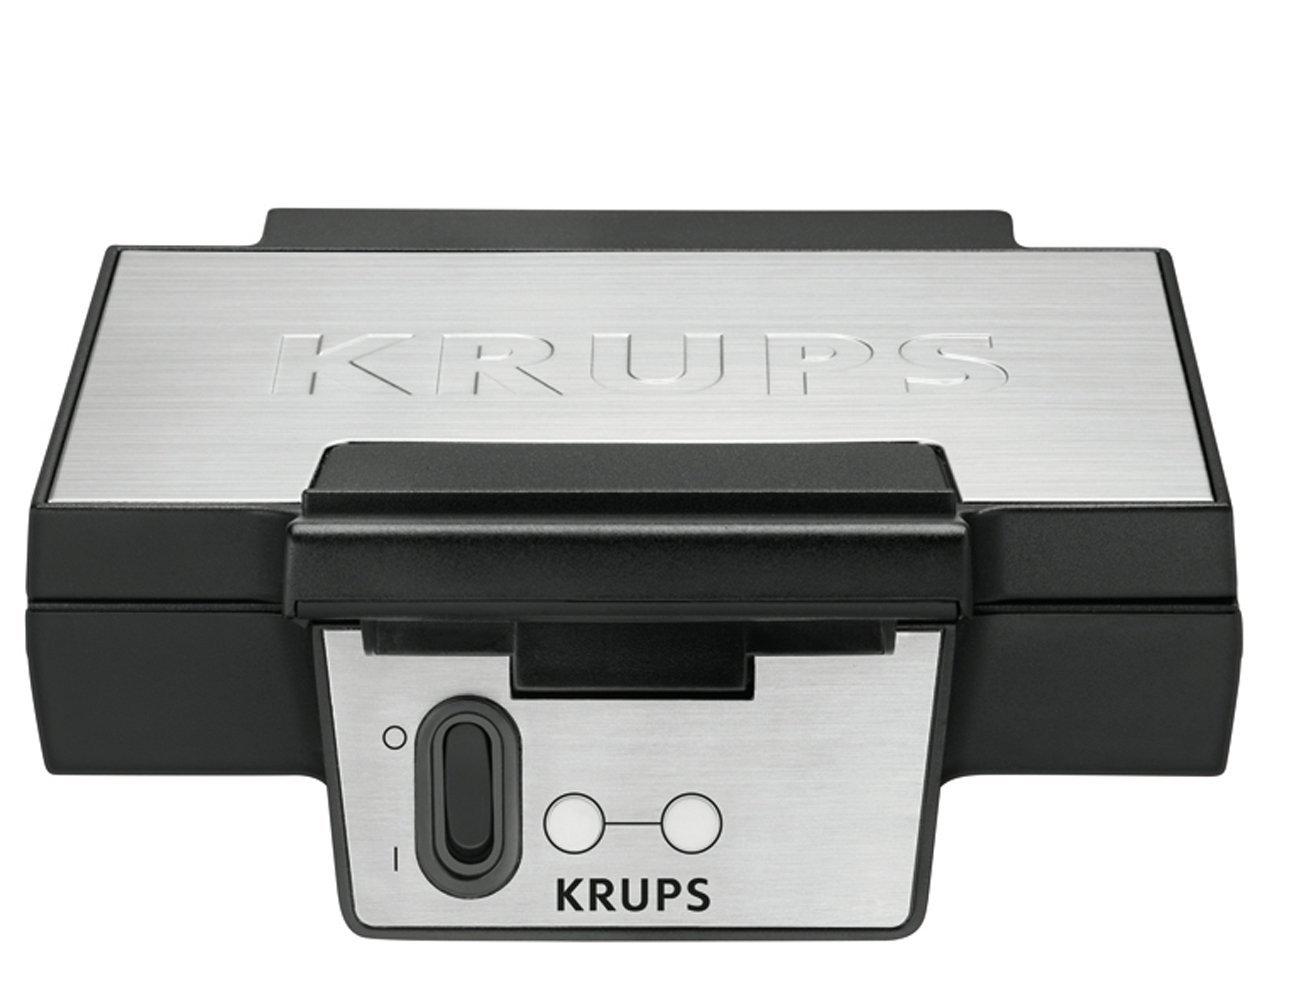 Krups FDK251 Waffelautomat silver/black vafeļu panna